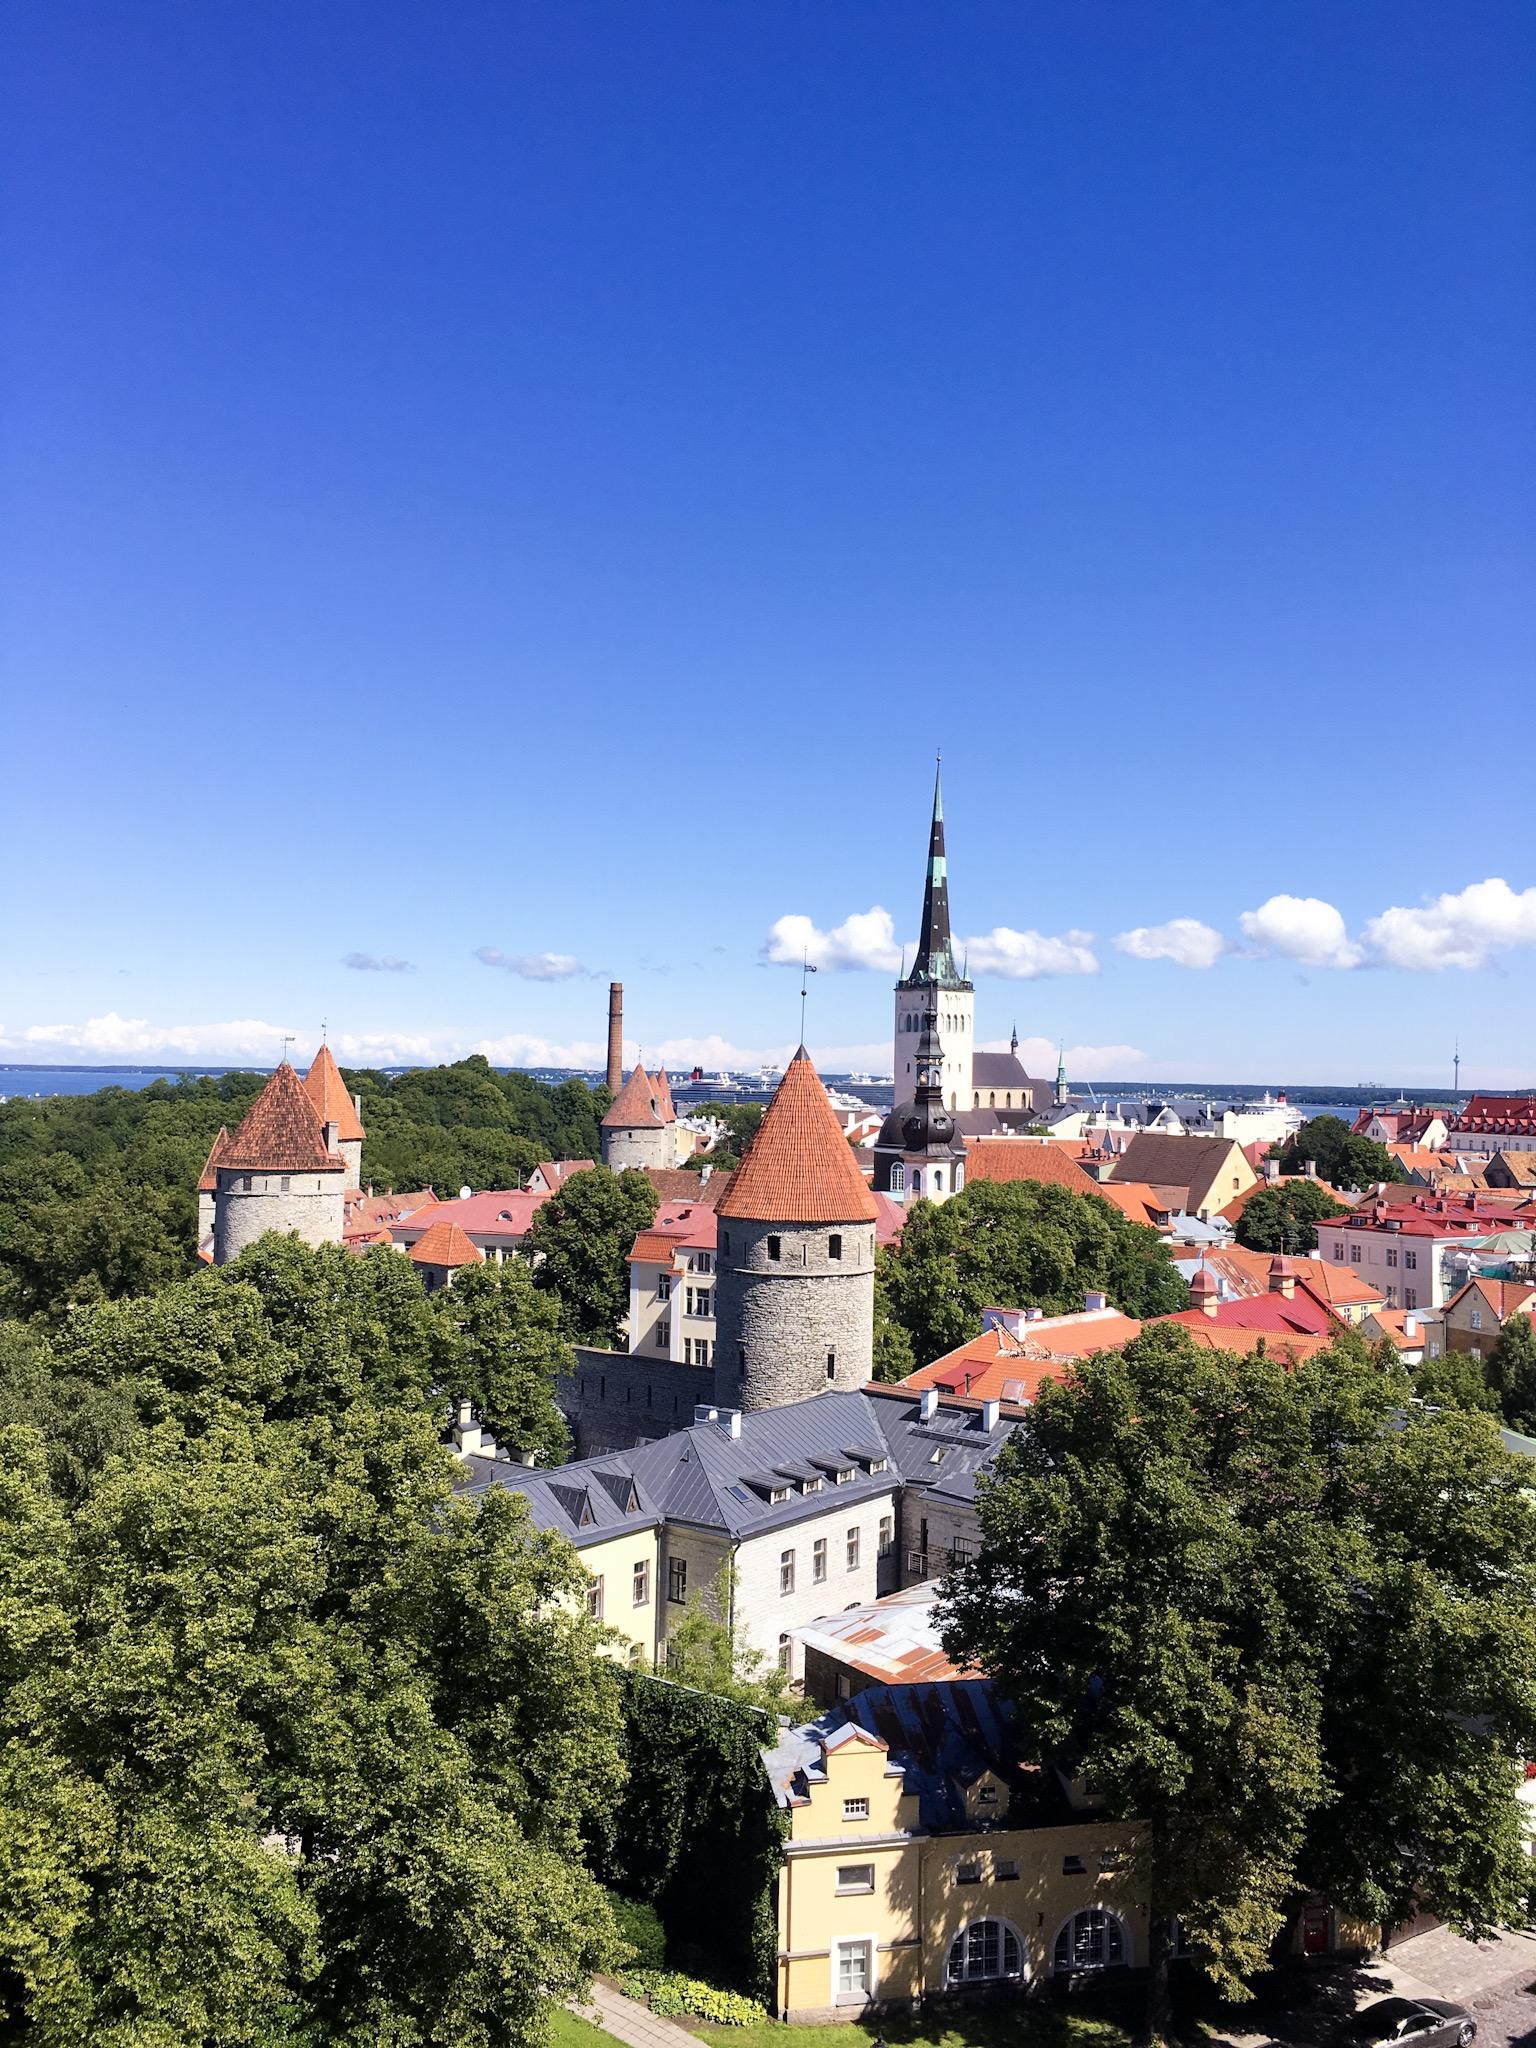 Blue skies over old town of Tallinn, Estonia